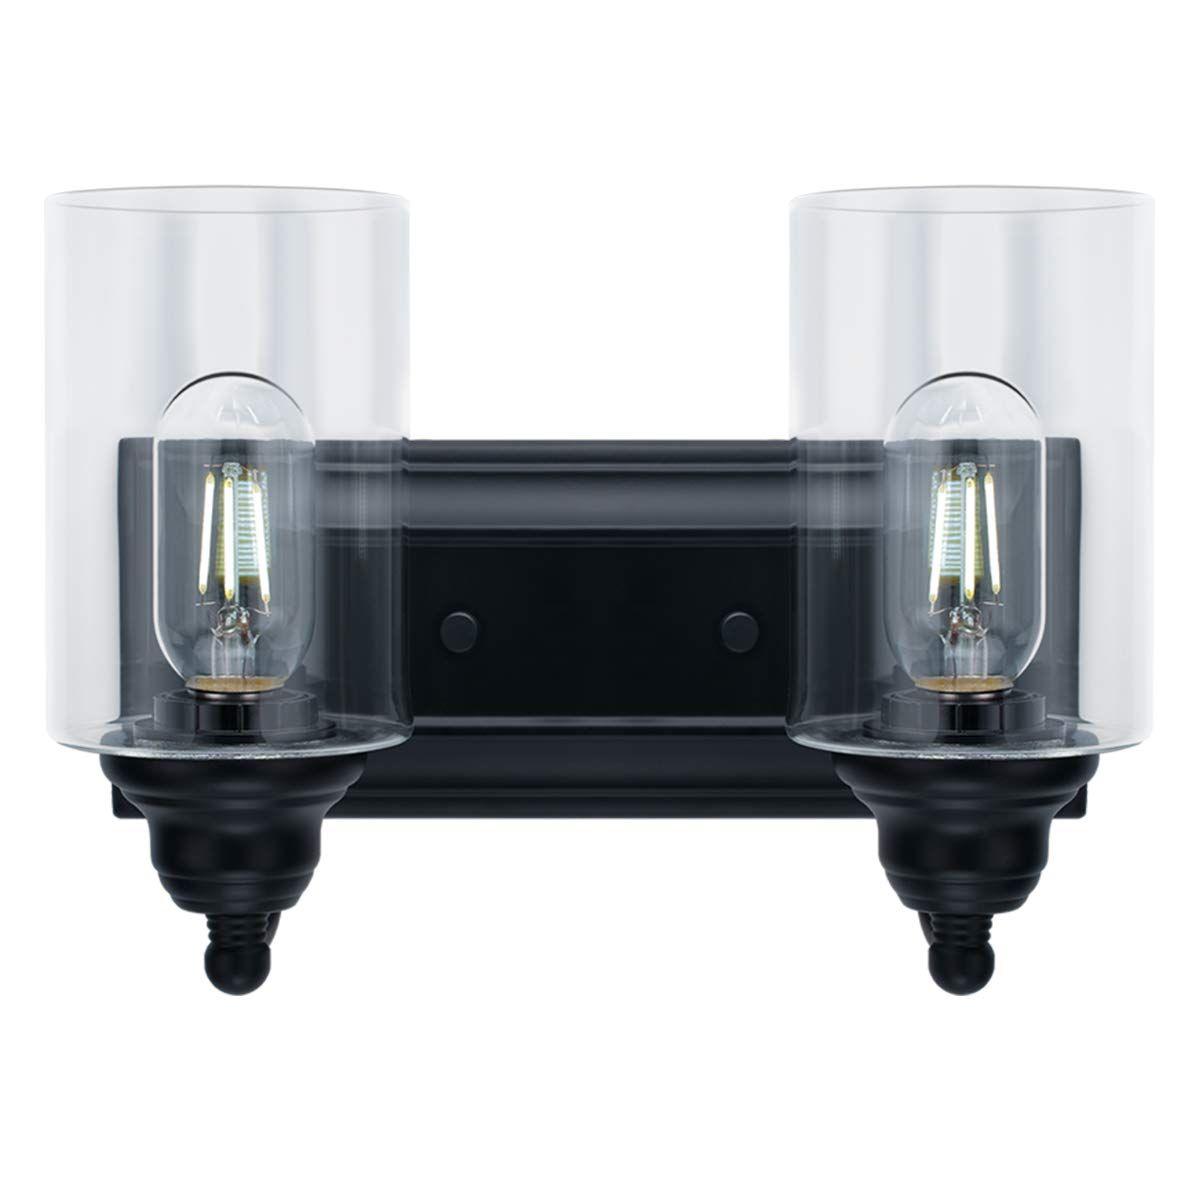 Photo of 2-Light Vanity Light Fixture Modern Clear Glass Shades Lighting Black Dining Room Lighting Fixtures